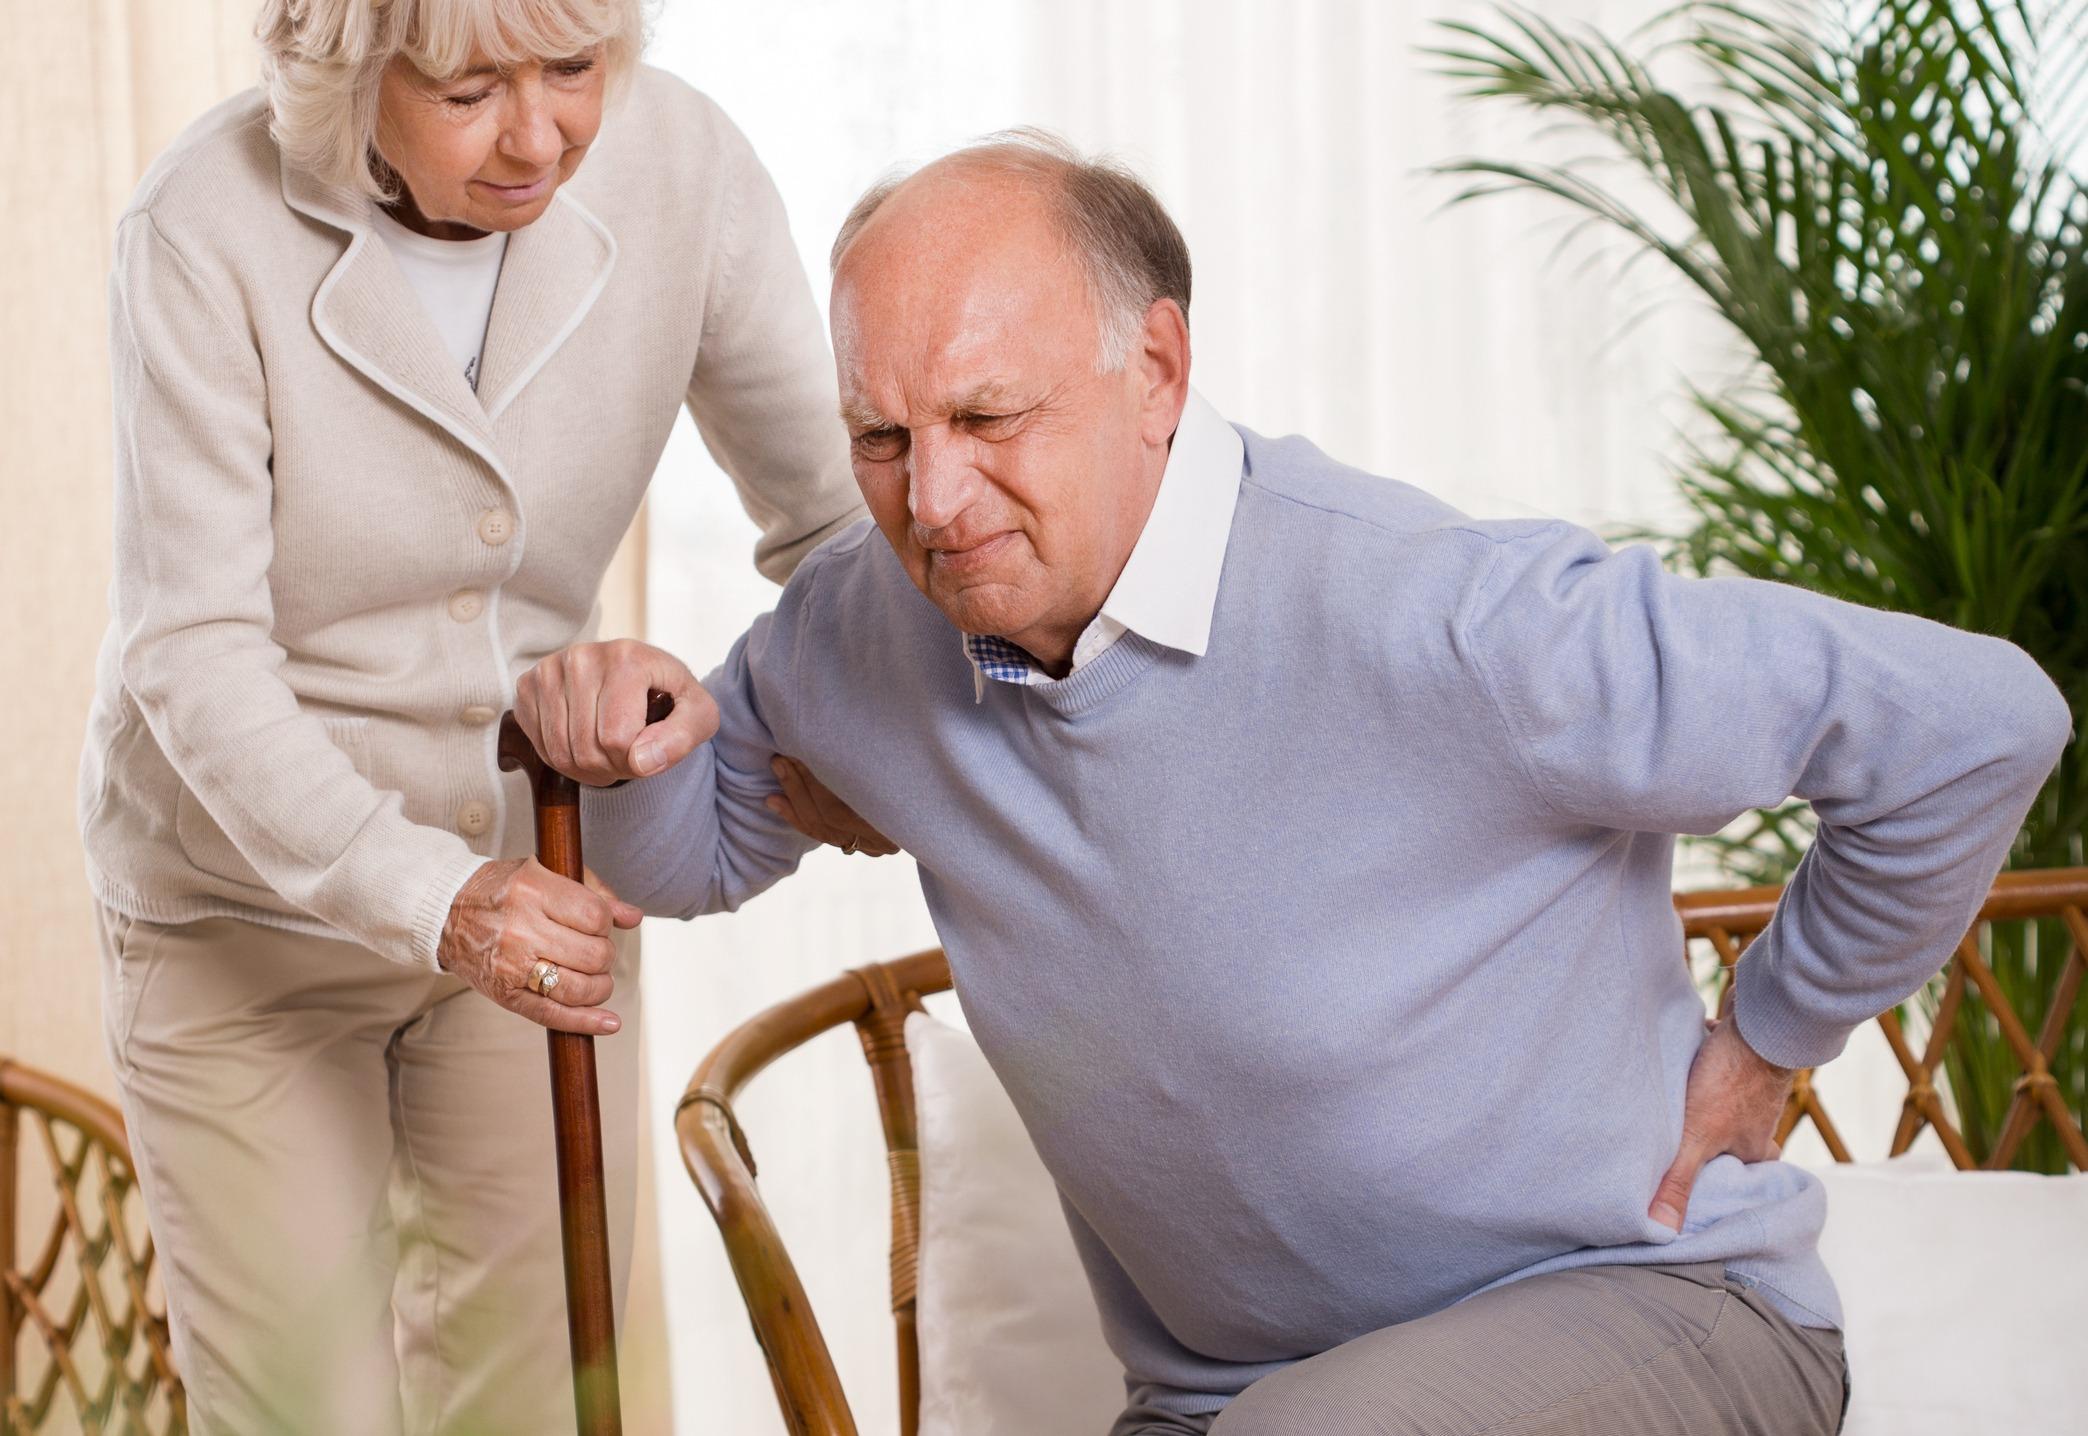 Older in pain